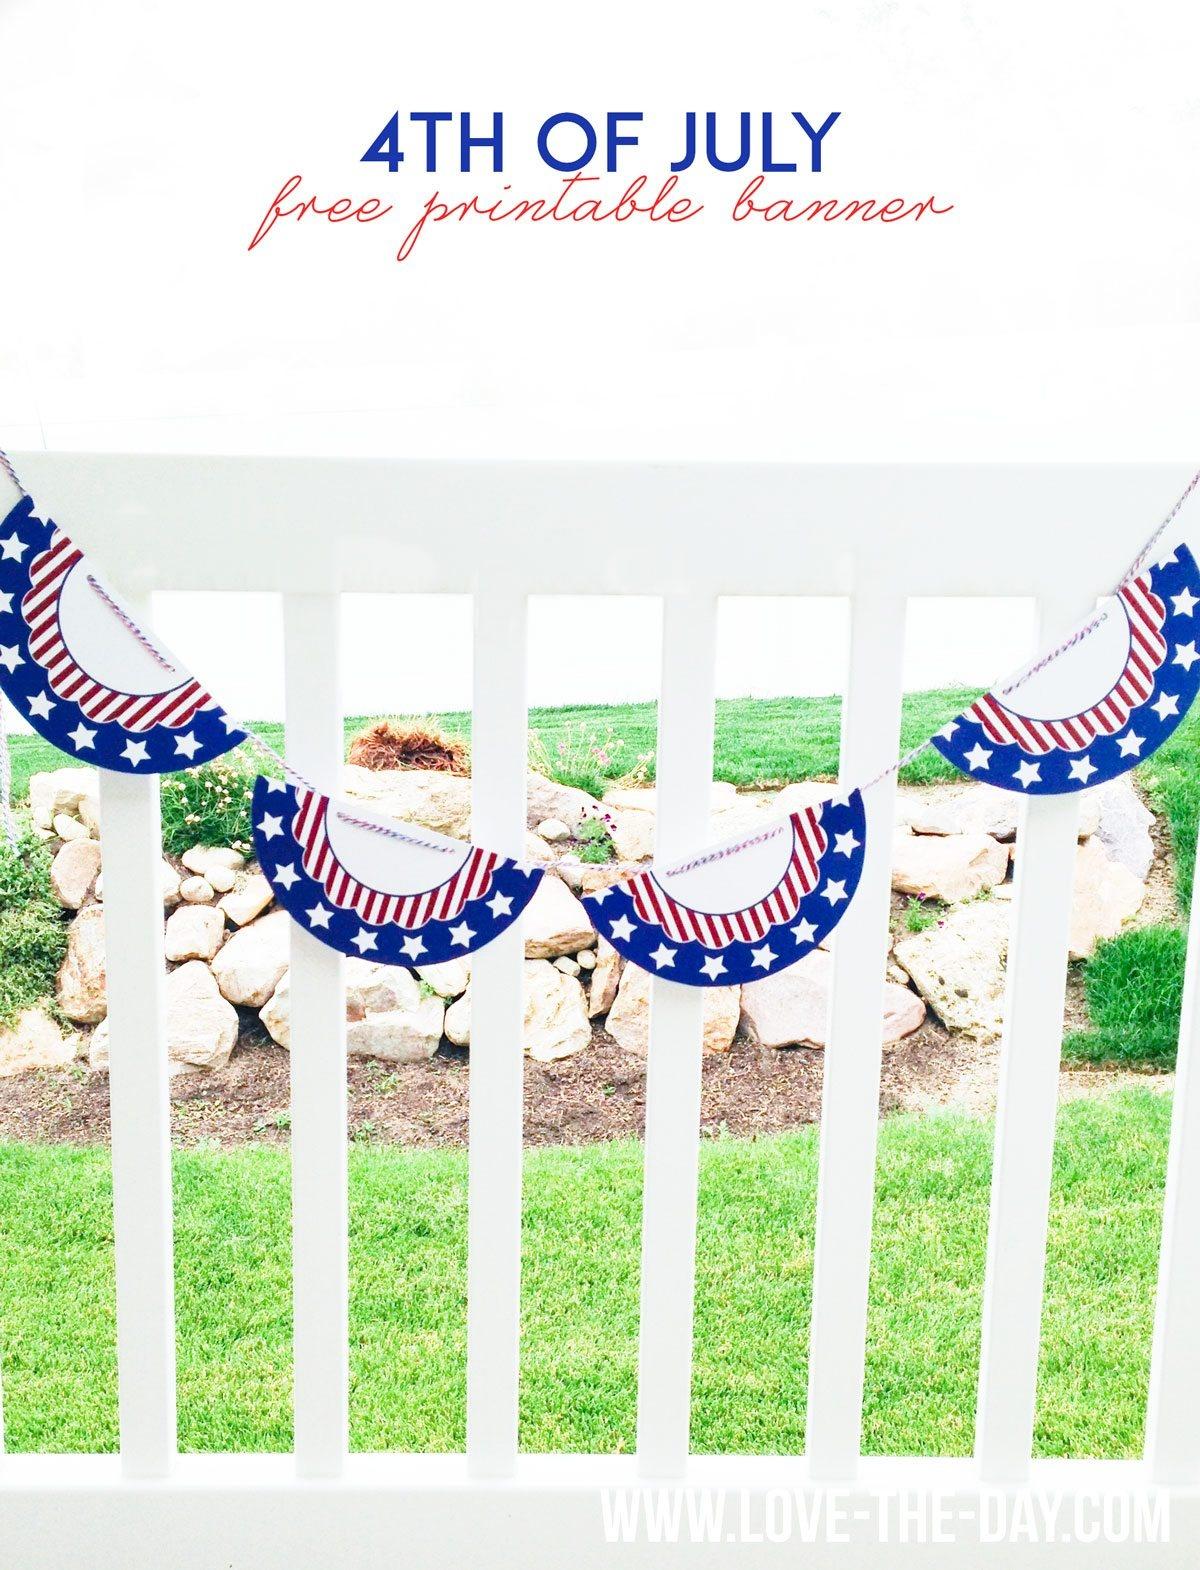 Free Printable 4Th Of July Buntinglindi Haws Of Love The Day - Free Printable 4Th Of July Pictures